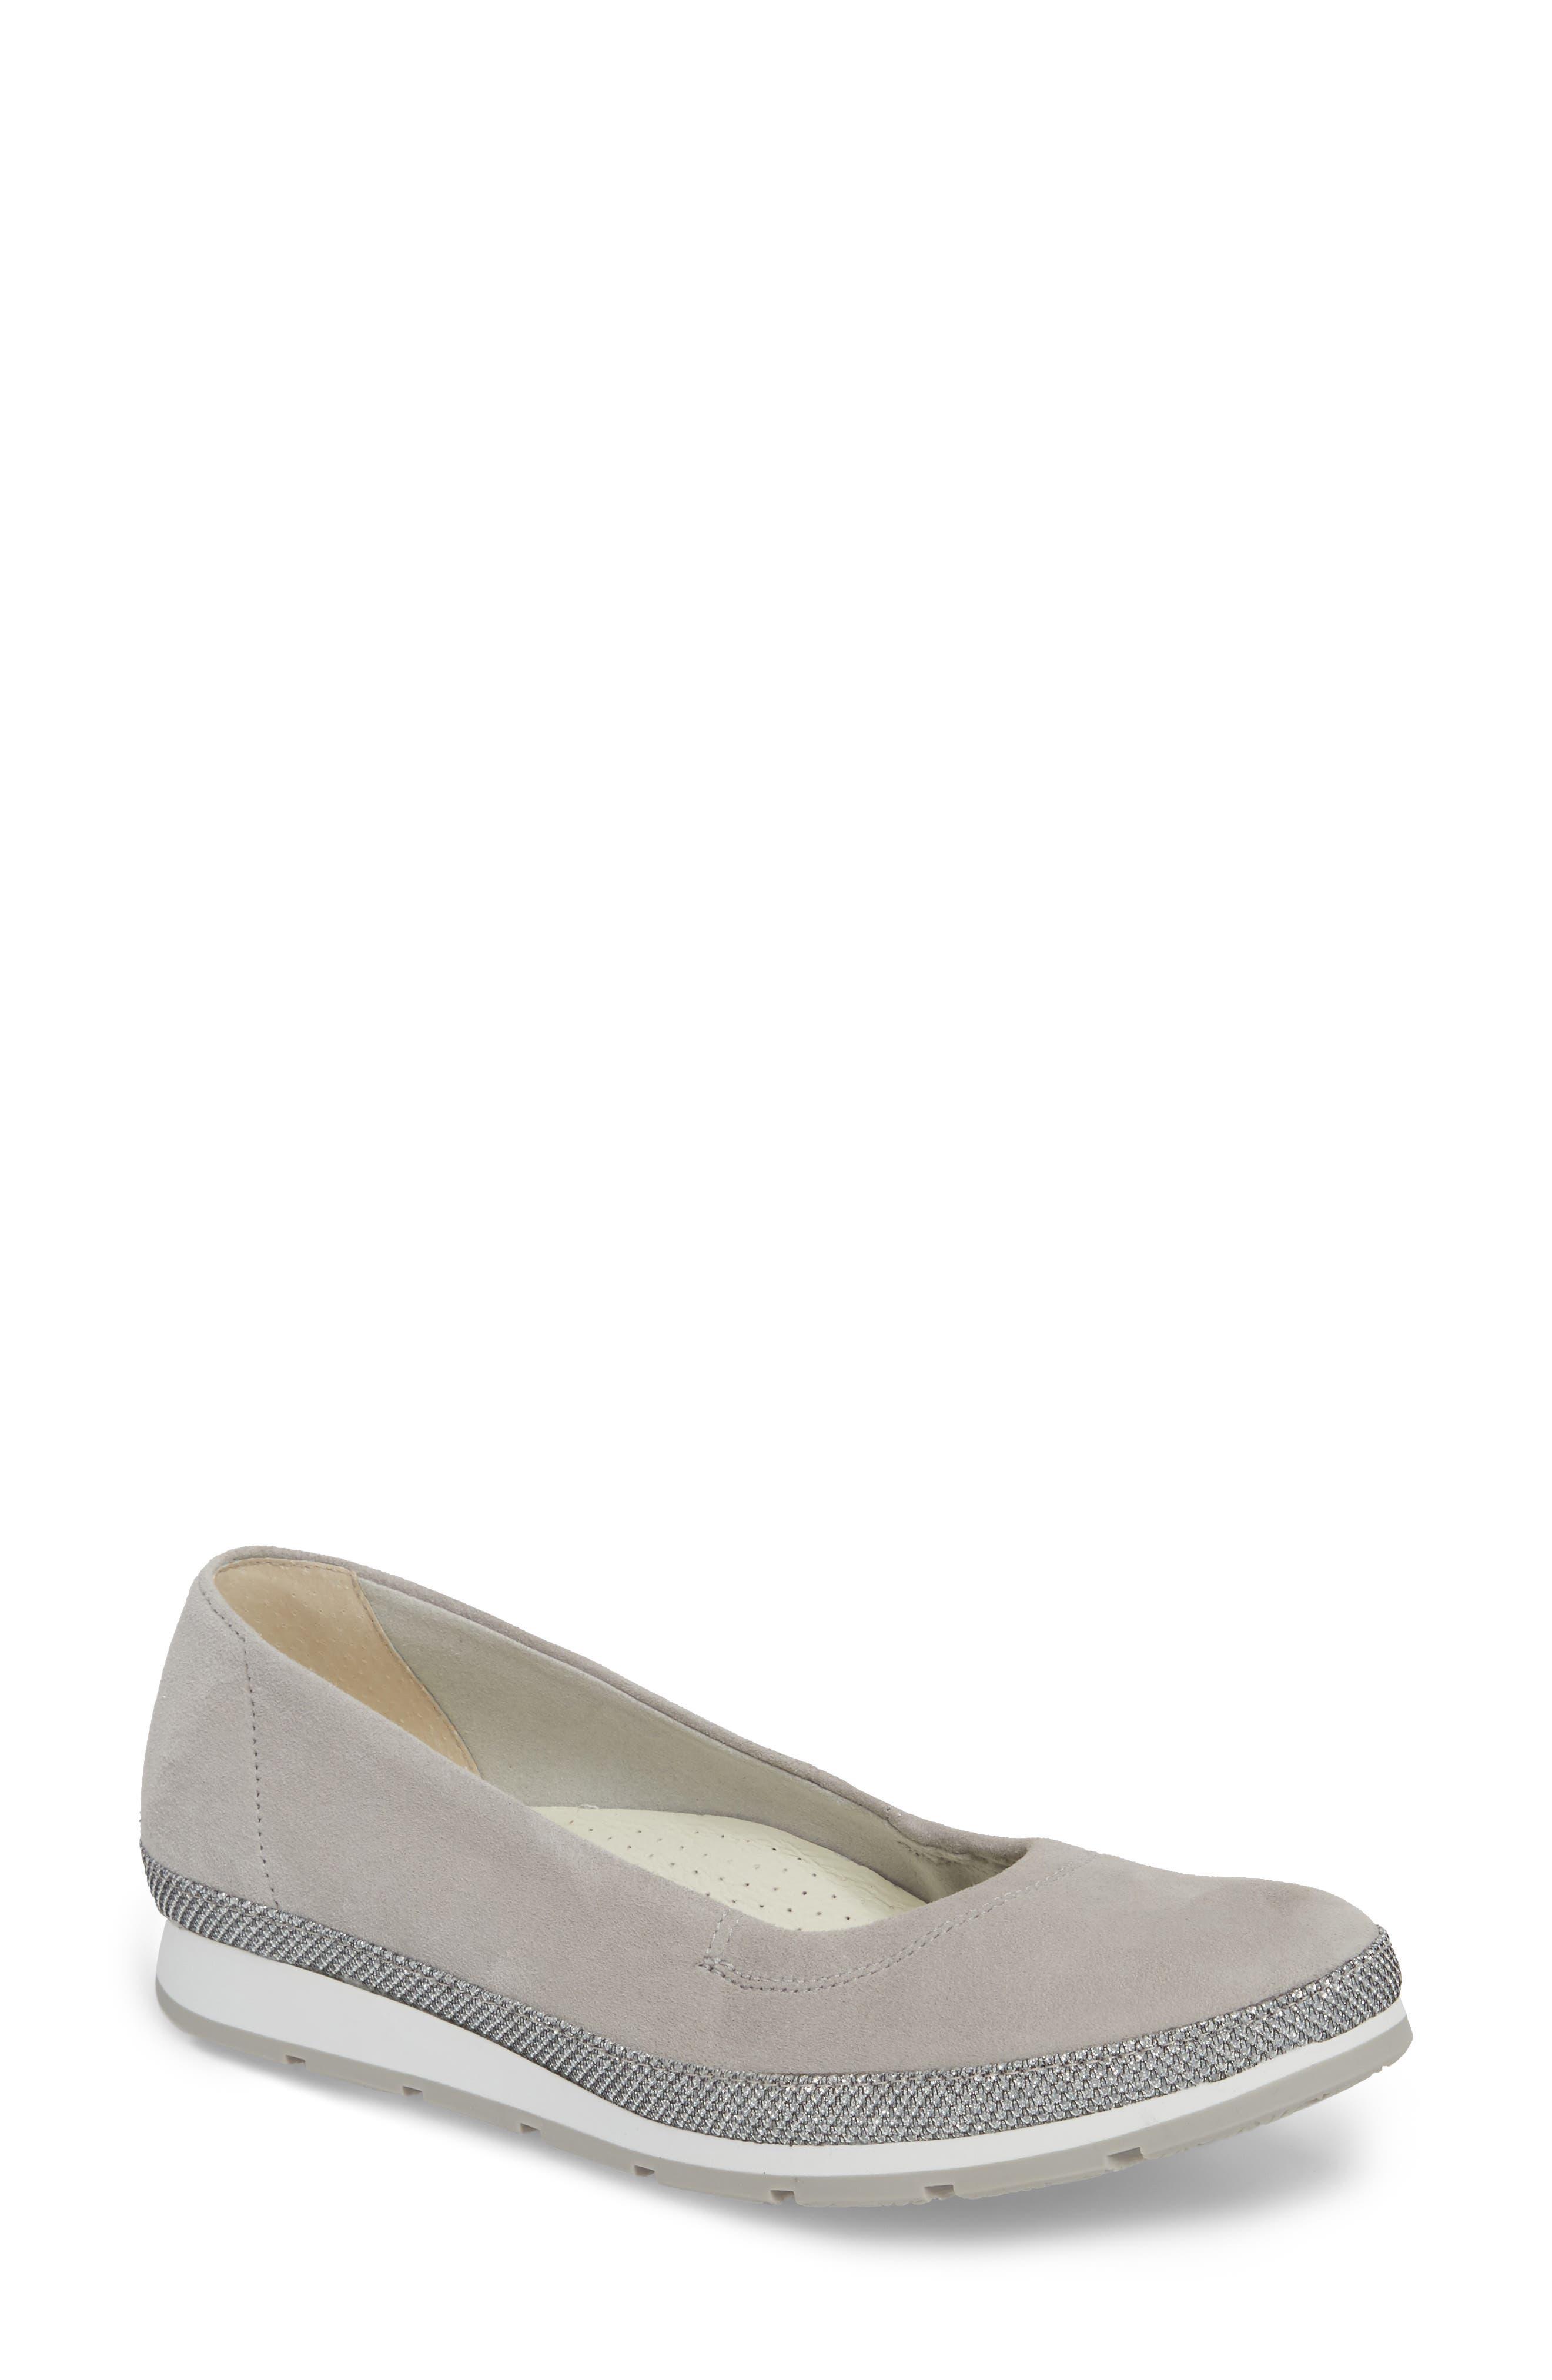 Gabor Skimmer Flat, Grey